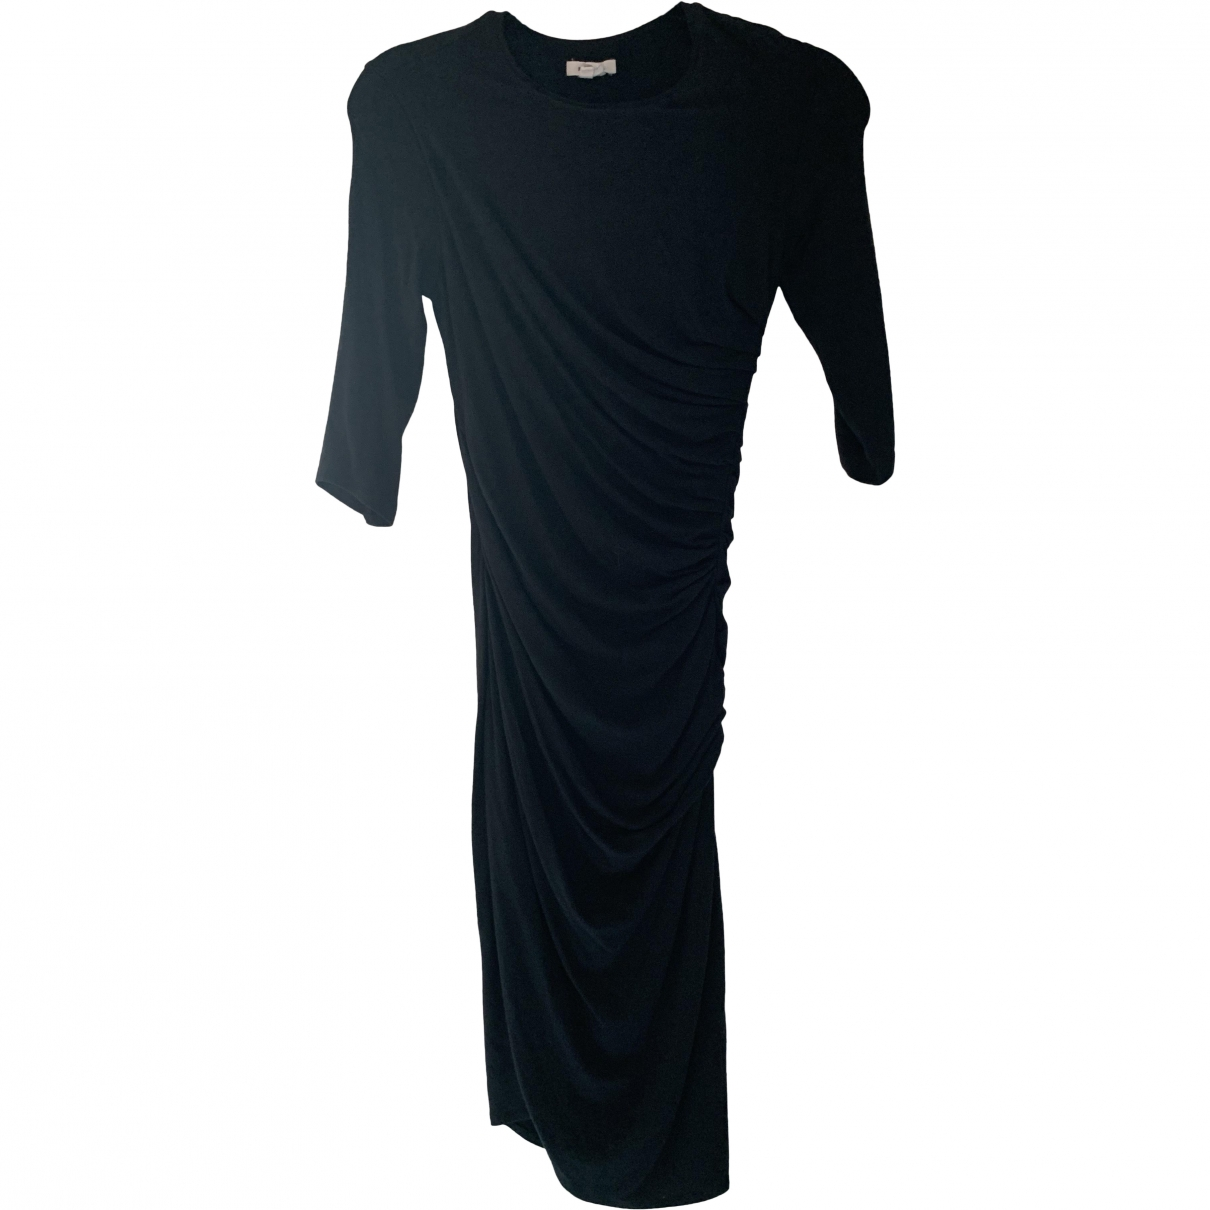 Helmut Lang \N Black Cotton dress for Women S International